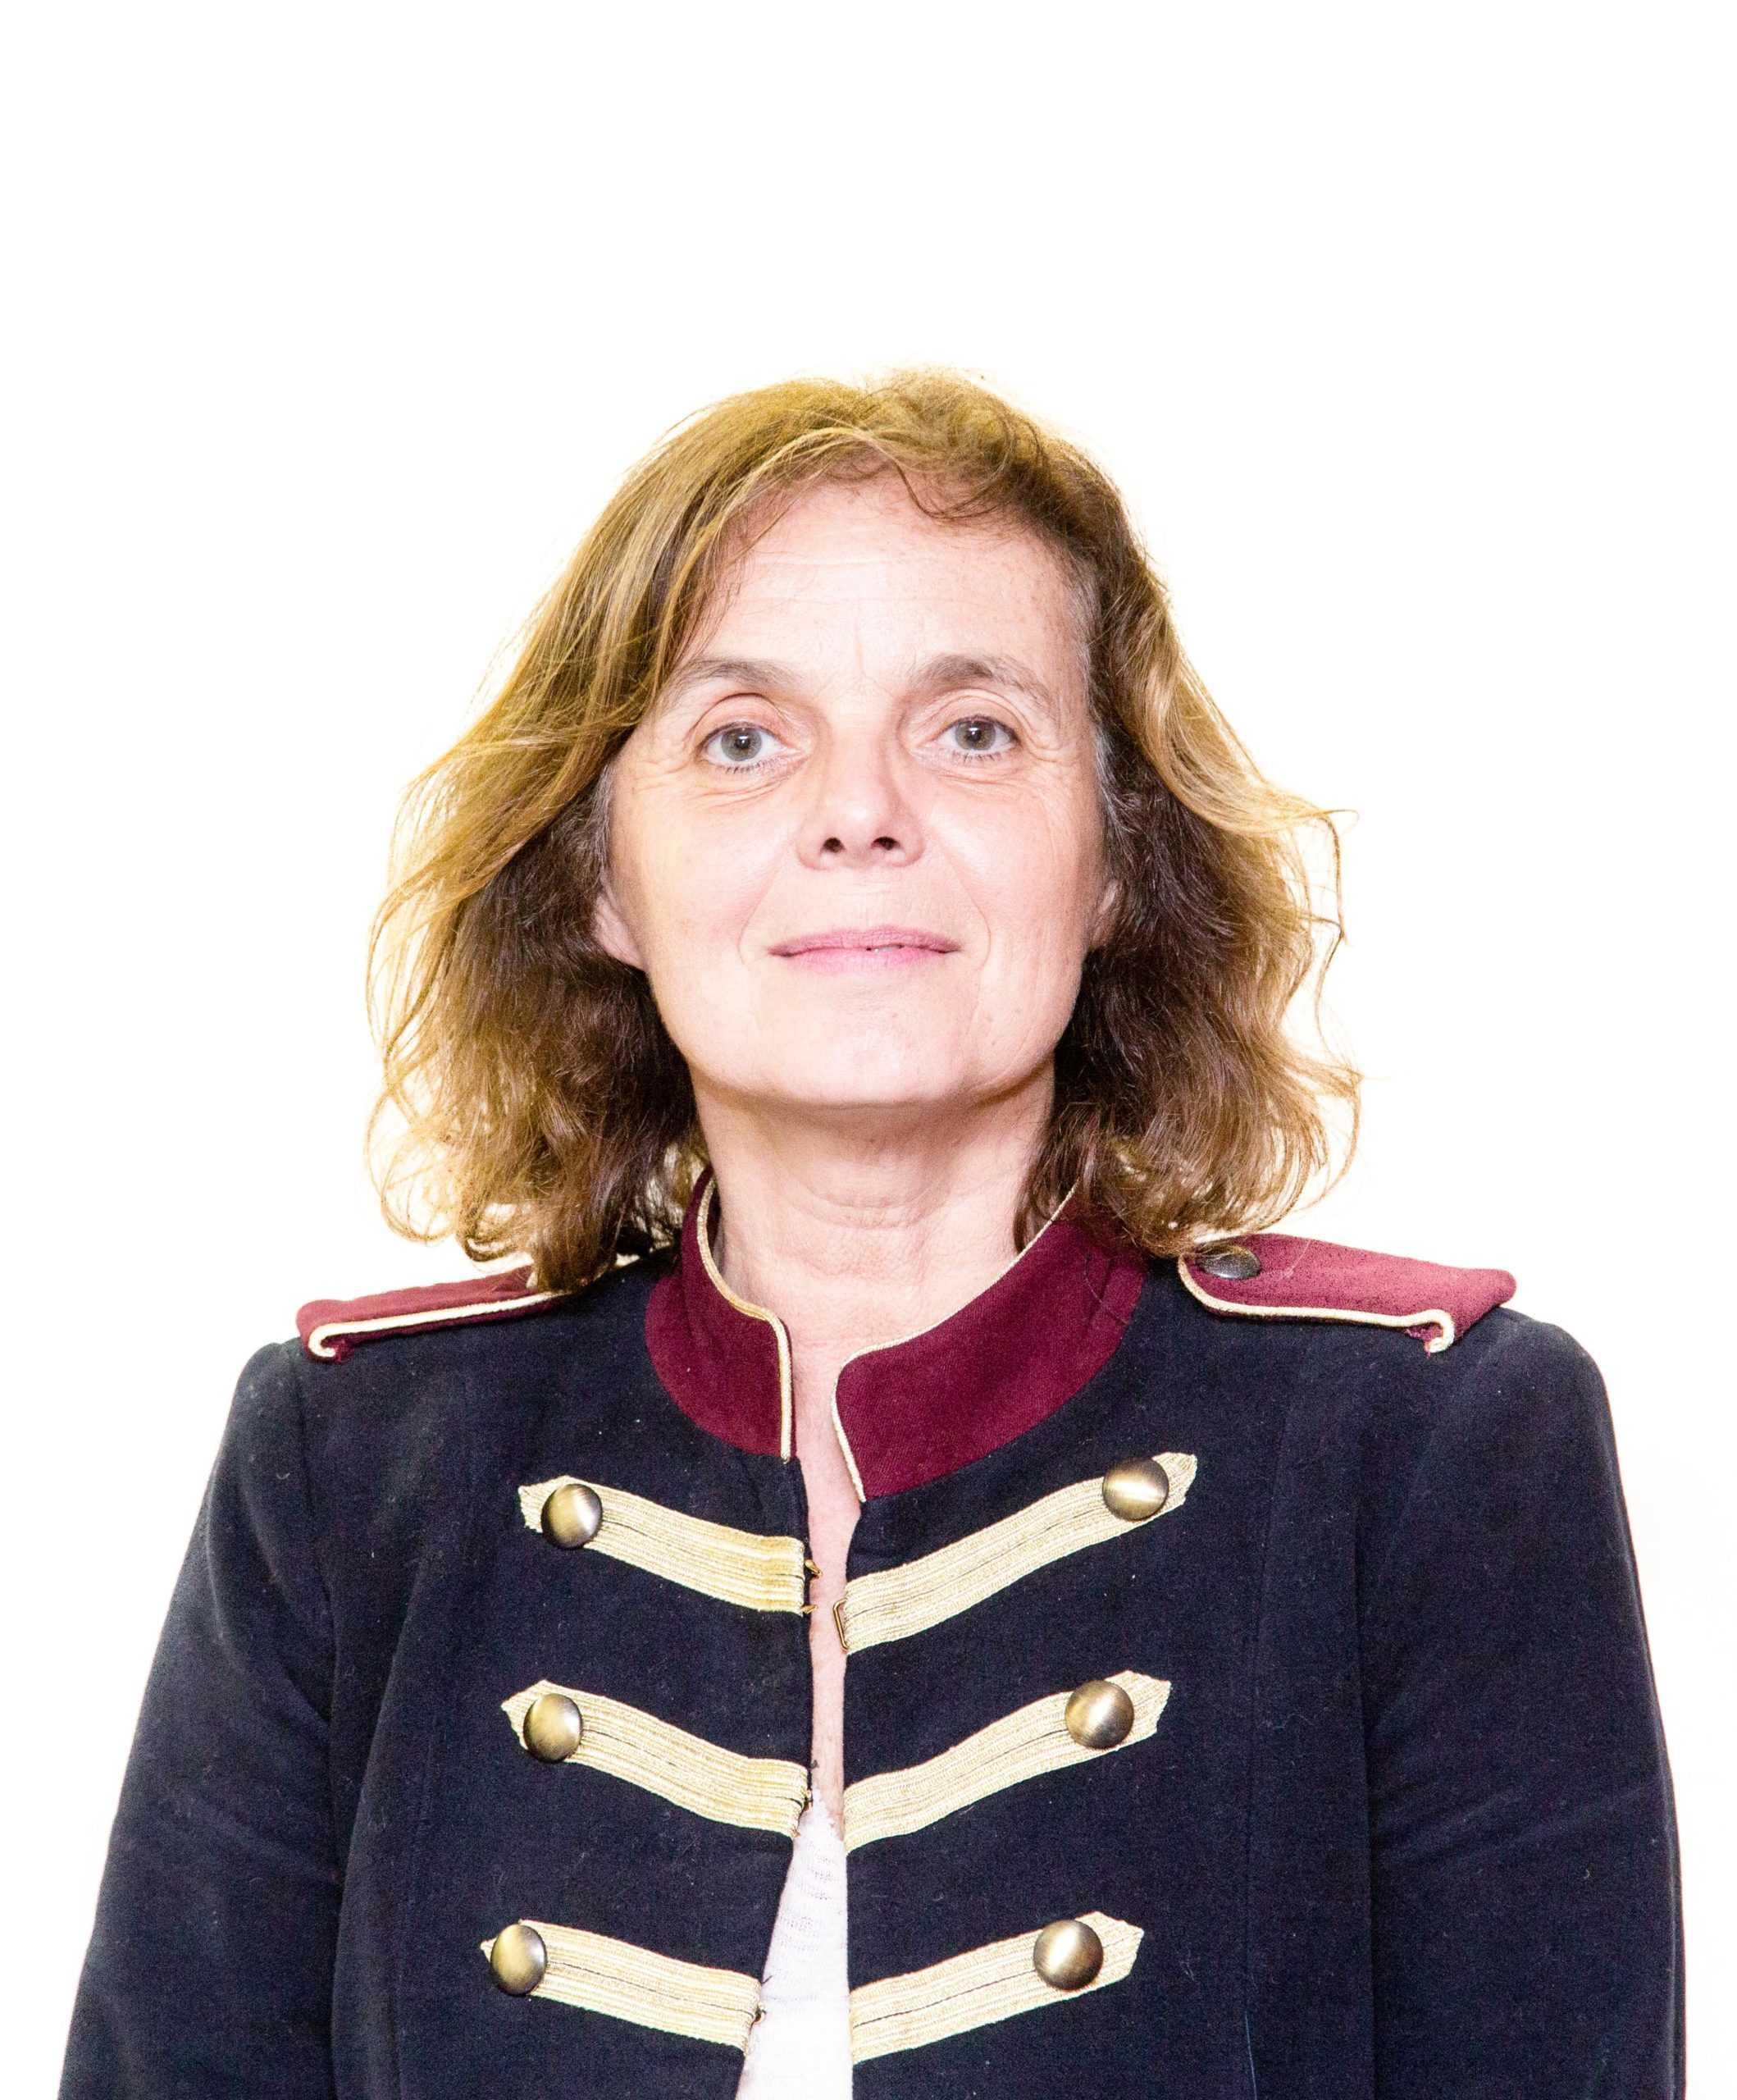 Portrait de Catherine Rivoallon